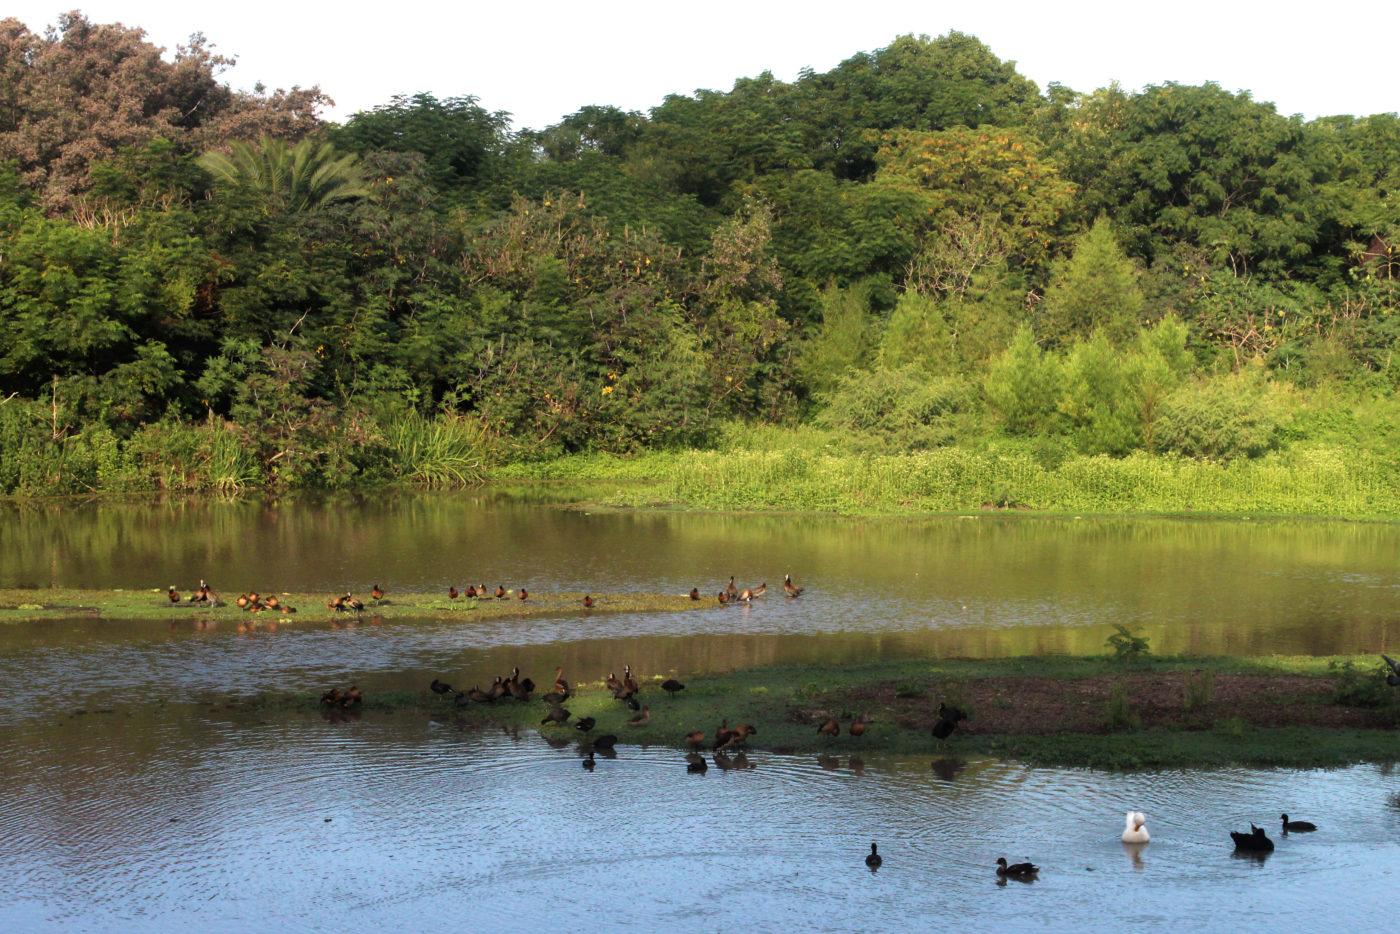 Buenos Aires Argentina Reserva Ecológica Costanera Sur